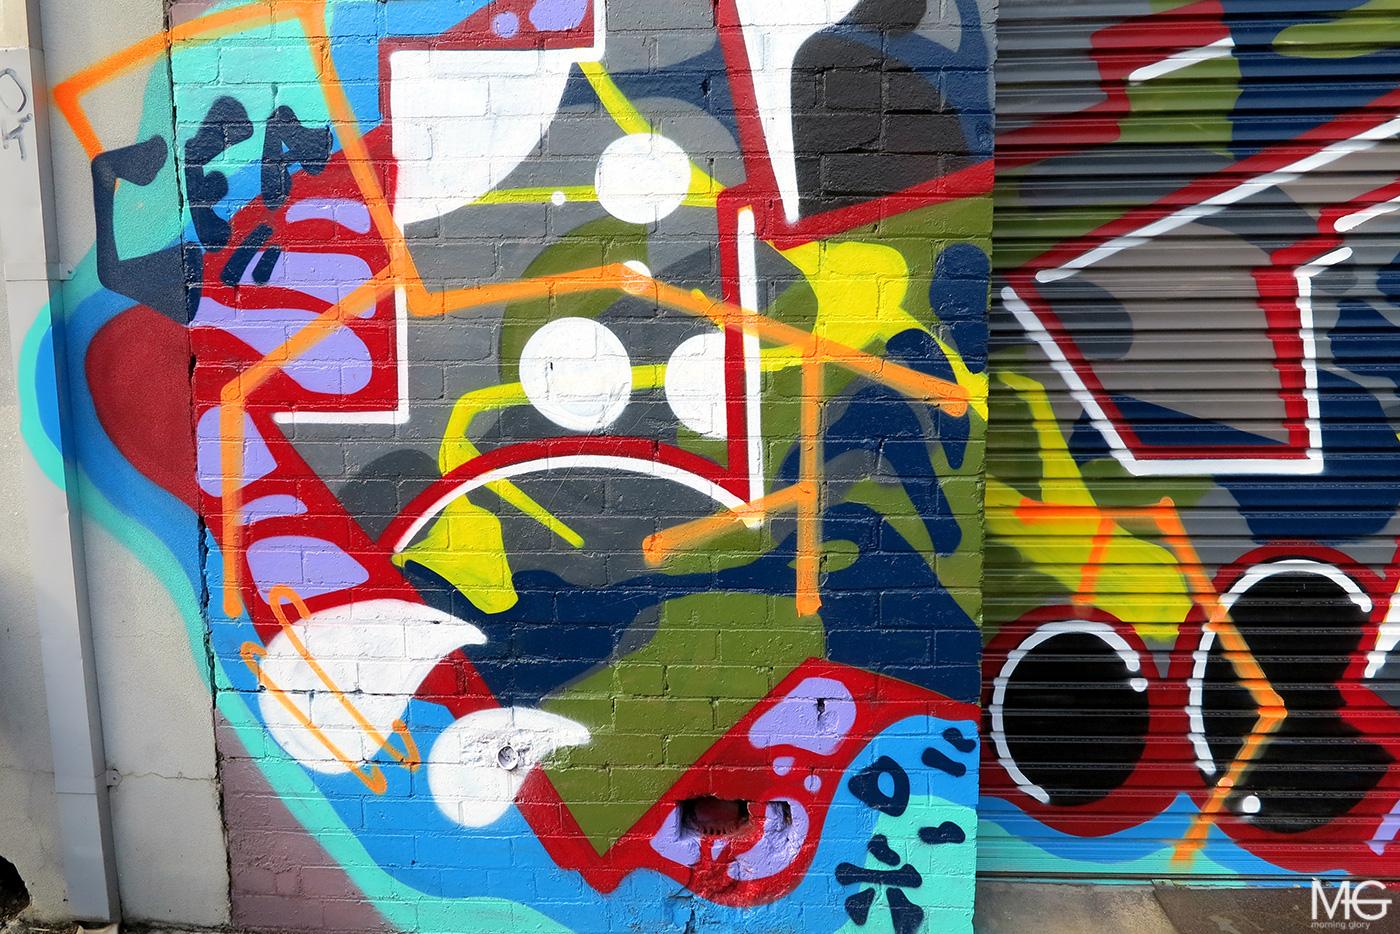 morning-glory-melbourne-graffiti-abbotsford-zeits